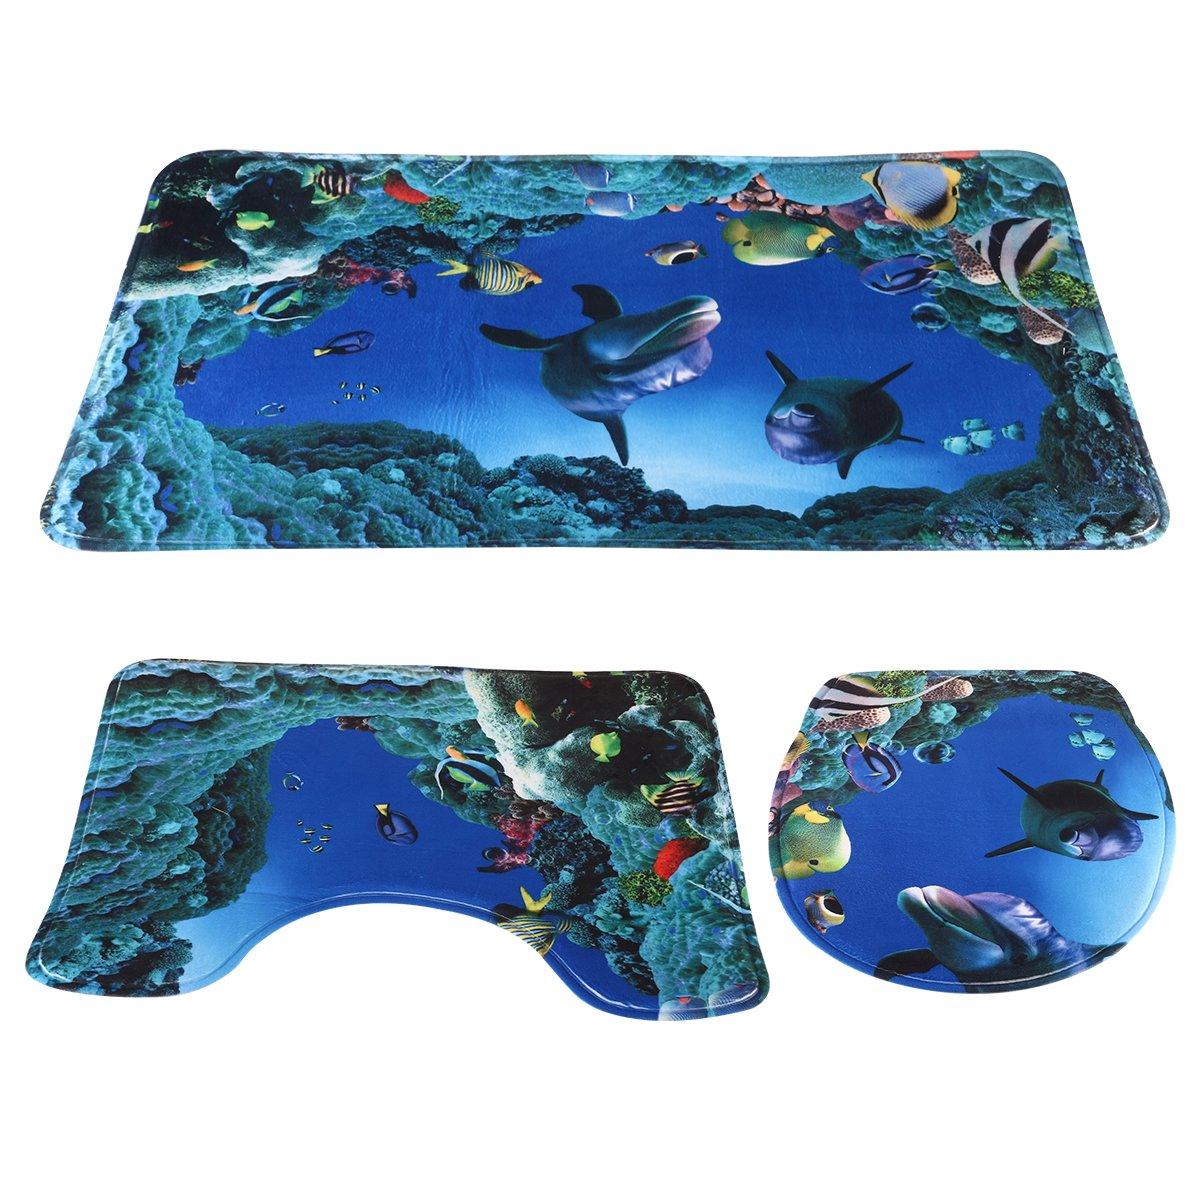 NUOLUX 3pcs/set Ocean Style Underwater World Dolphin Carpe Toilet Mat